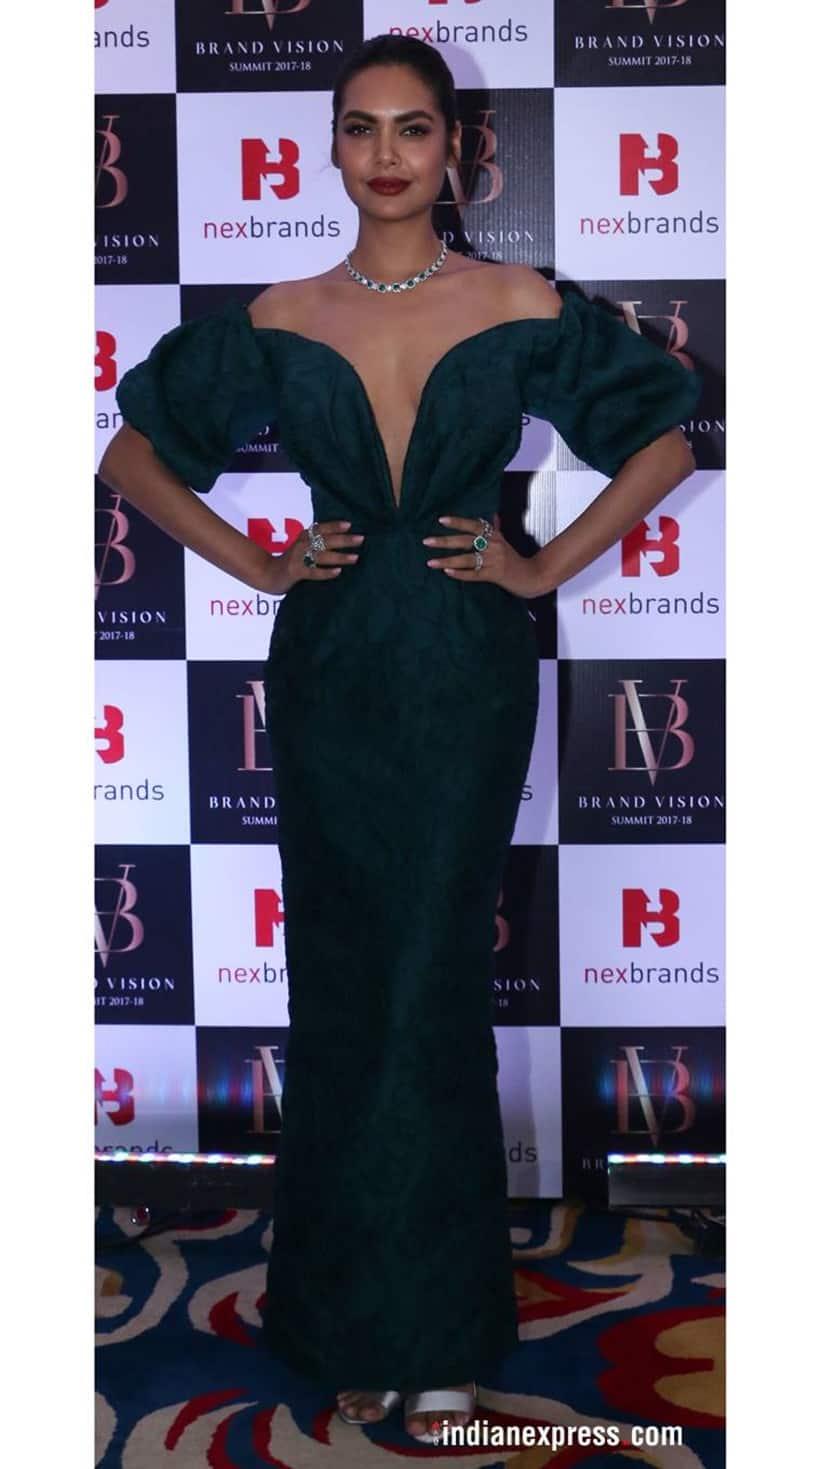 Deepika Padukone, Priyanka Chopra, Manushi Chillar, Shilpa Shetty, Esha Gupta, Vaani Kapoor, Anushka Sharma, Tamannaah Bhatia, Kriti Sanon, celeb fashion, Fashion hits and misses, bollywood style file, indian express, indian express news